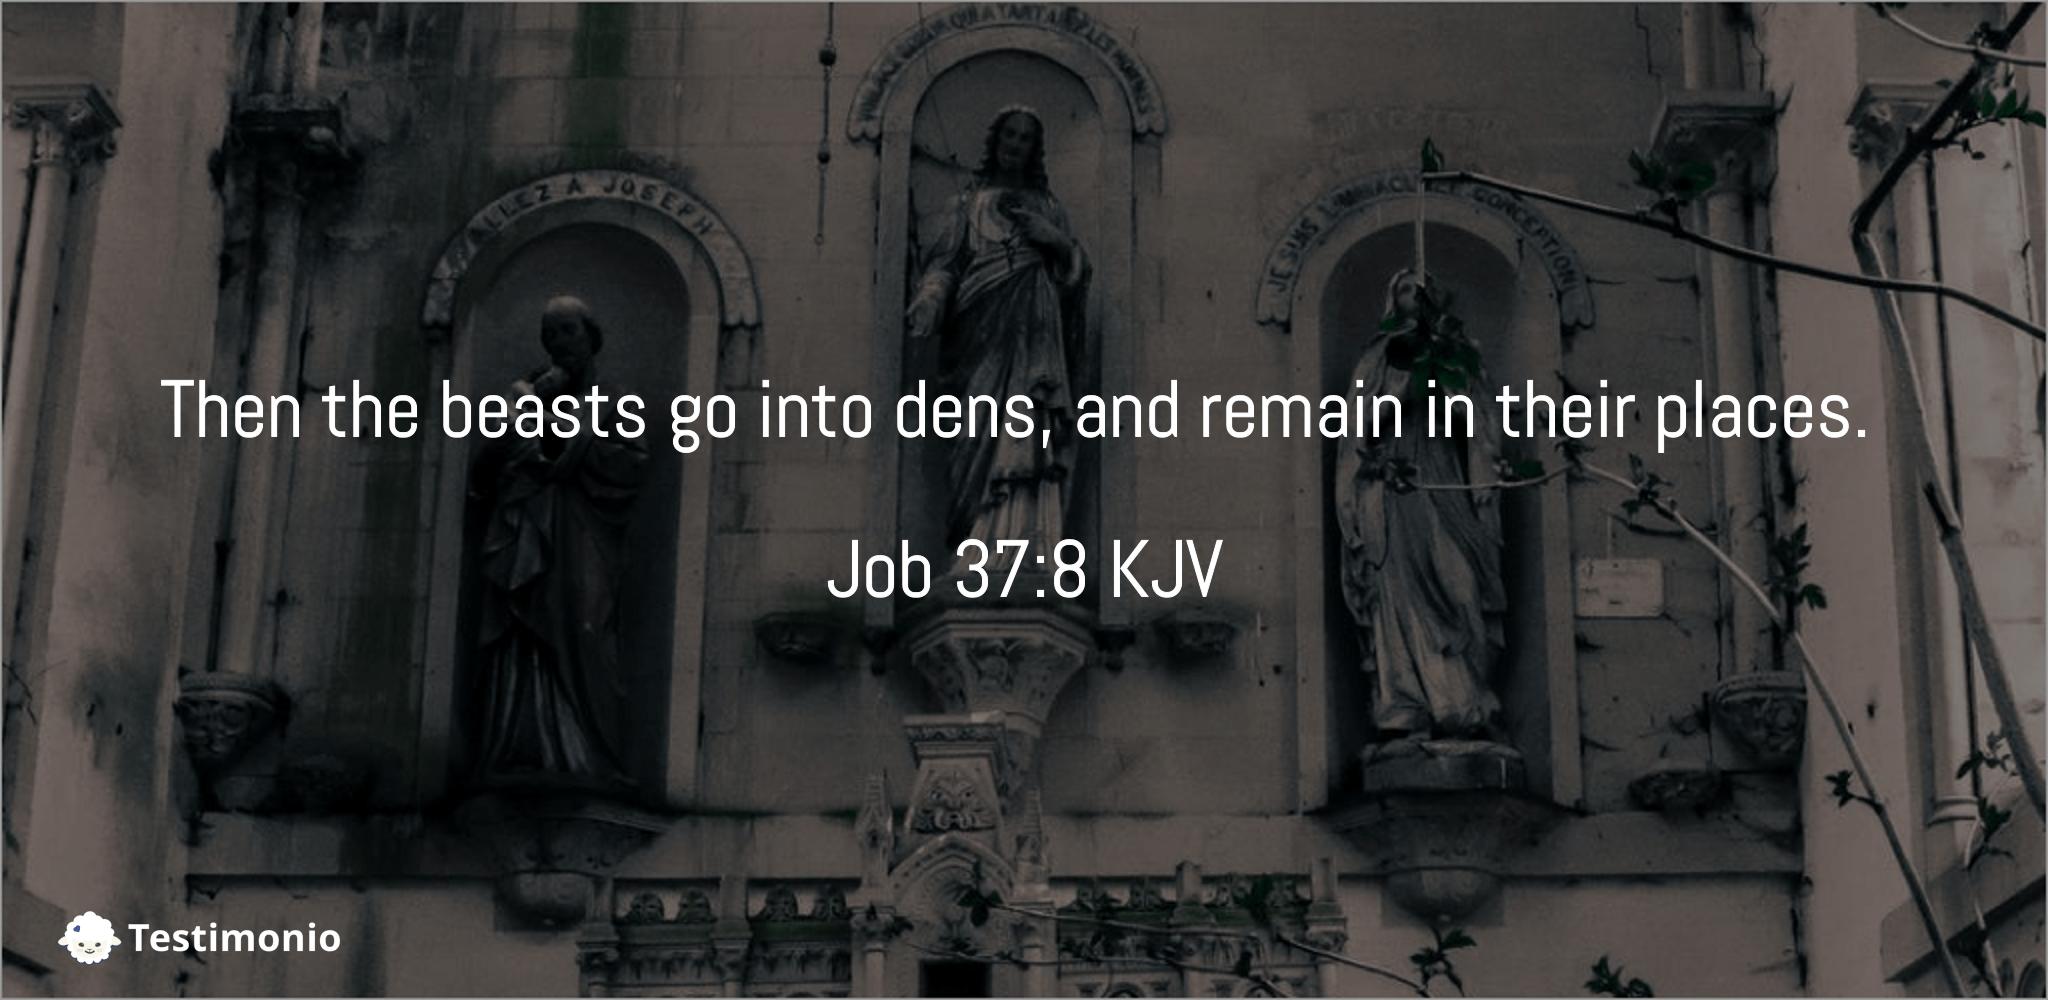 Job 37:8